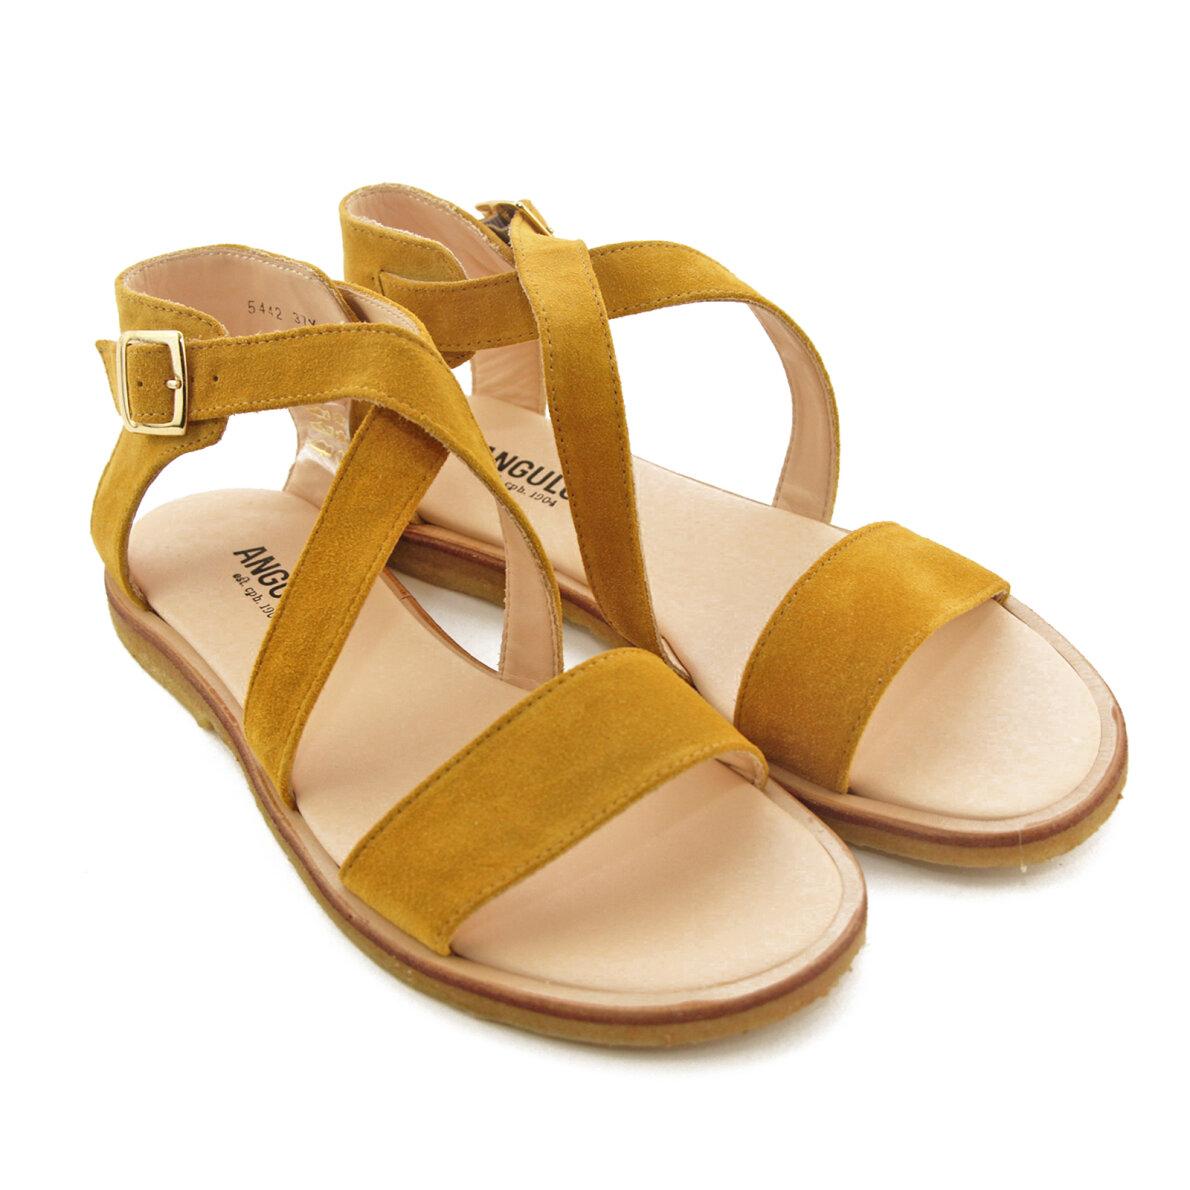 a55f36119c85 Angulus 5442 Gul - Dame sandal med spænde - Piedi.dk